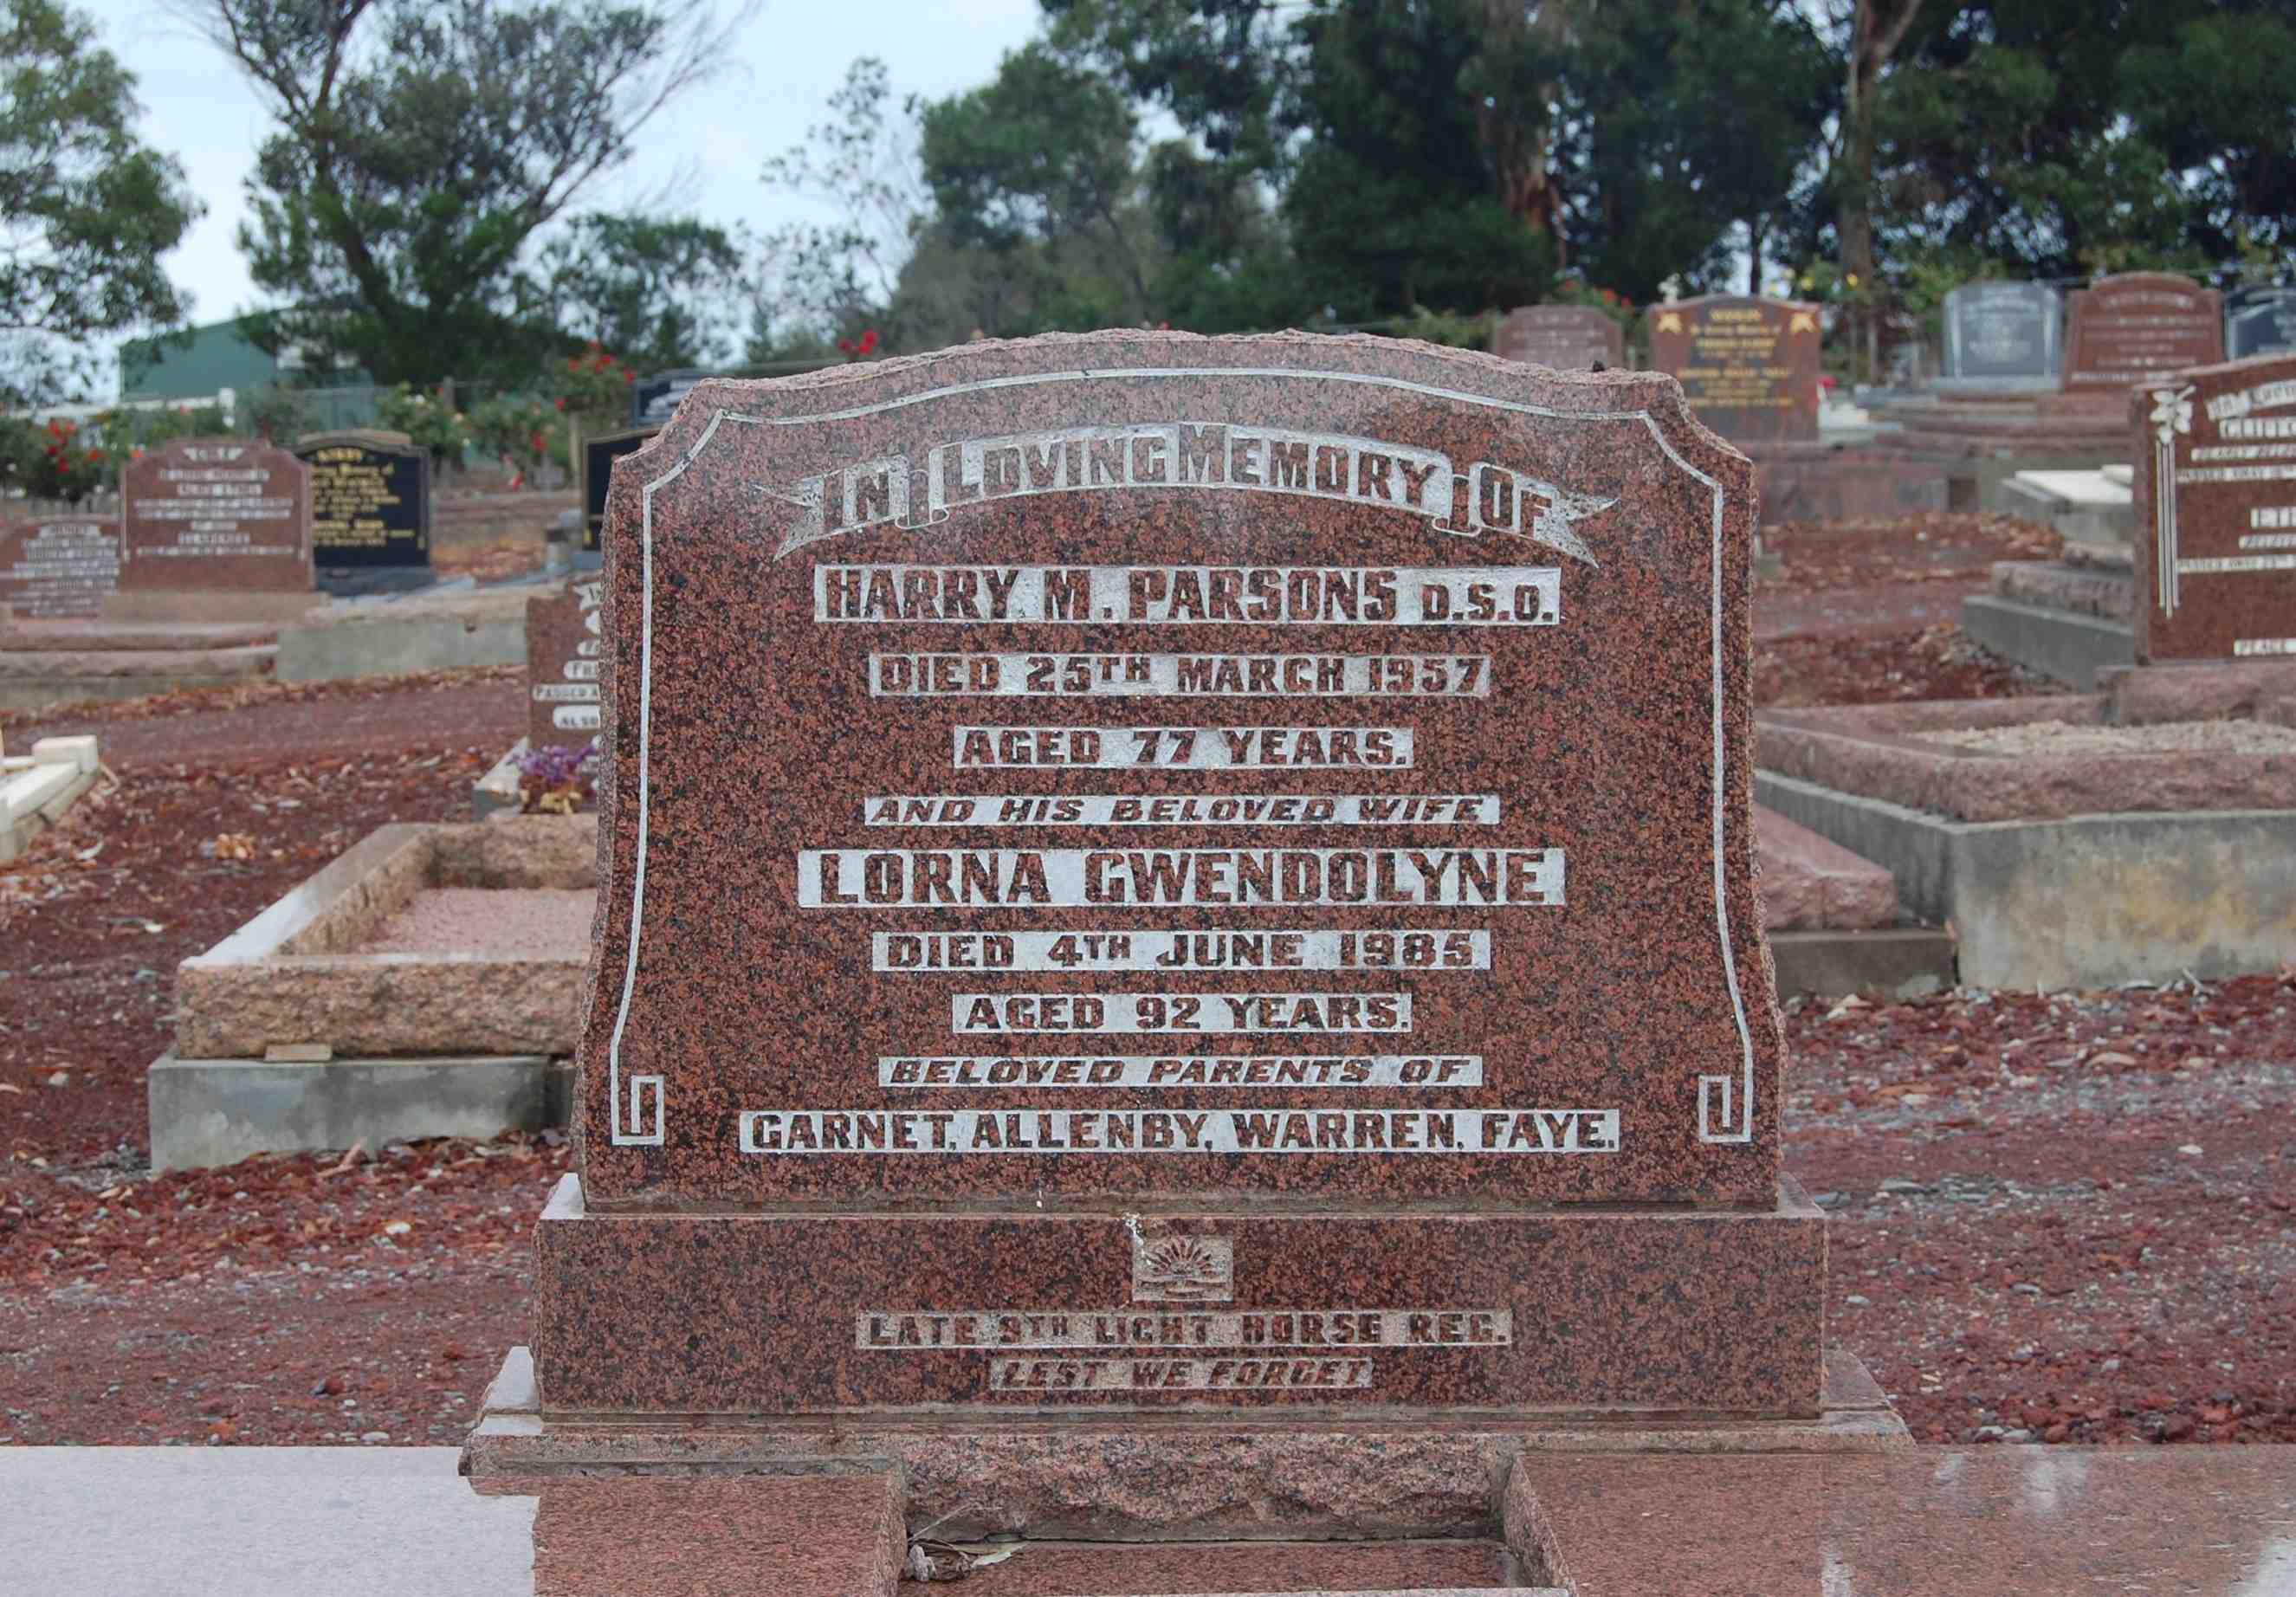 (3) PARSONS, Harry Meshach (Major), grave